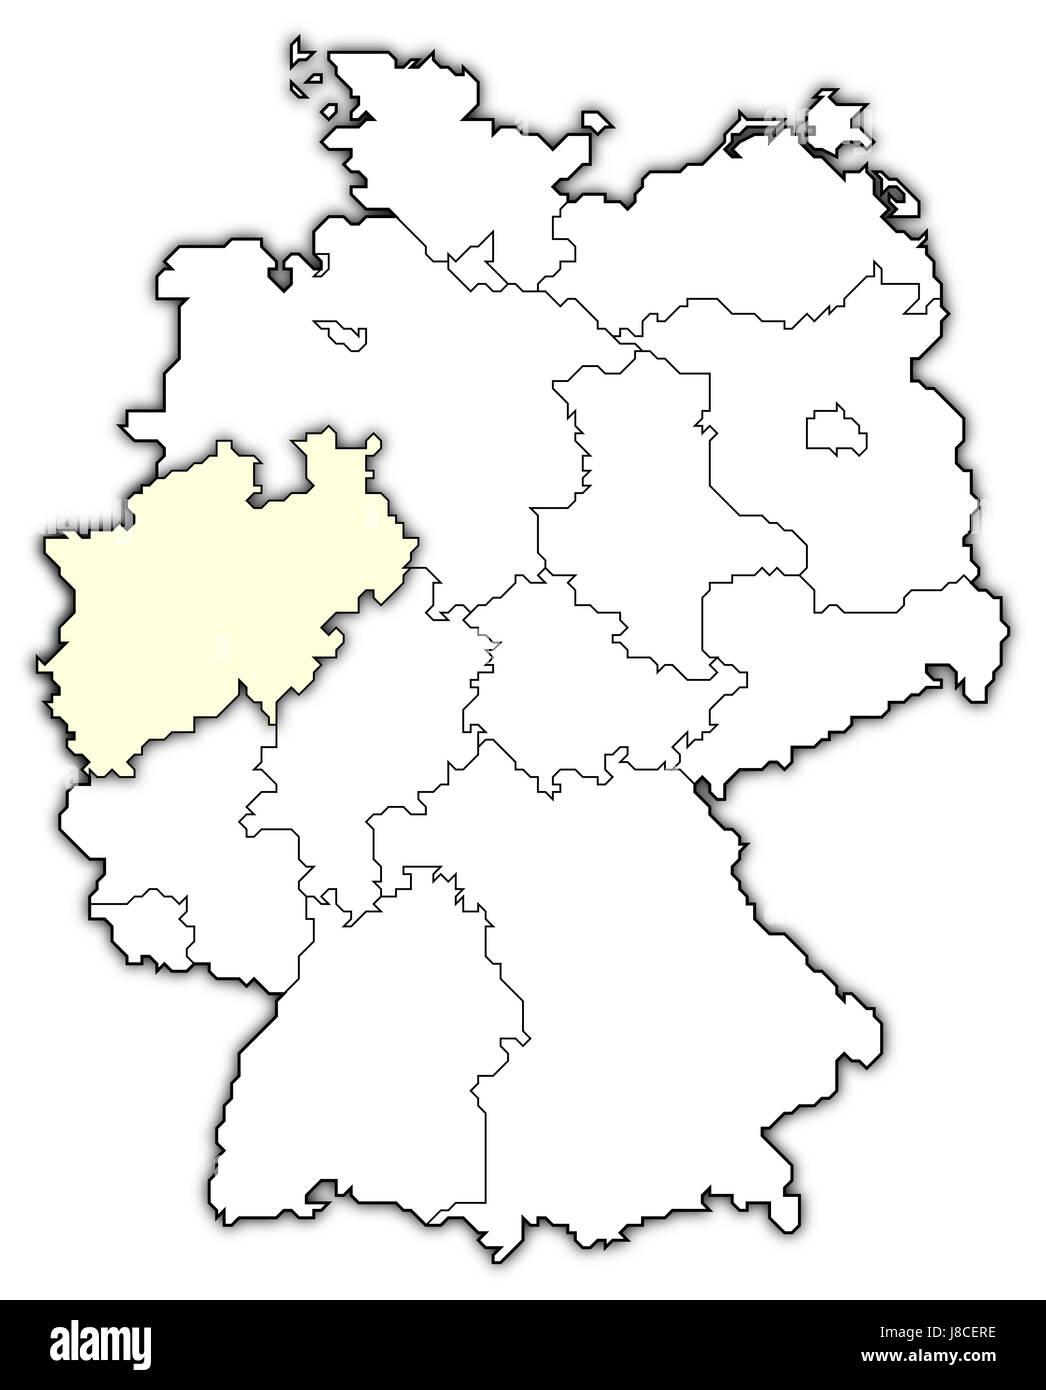 map of germany,north rhine-westphalia highlighted - Stock Image